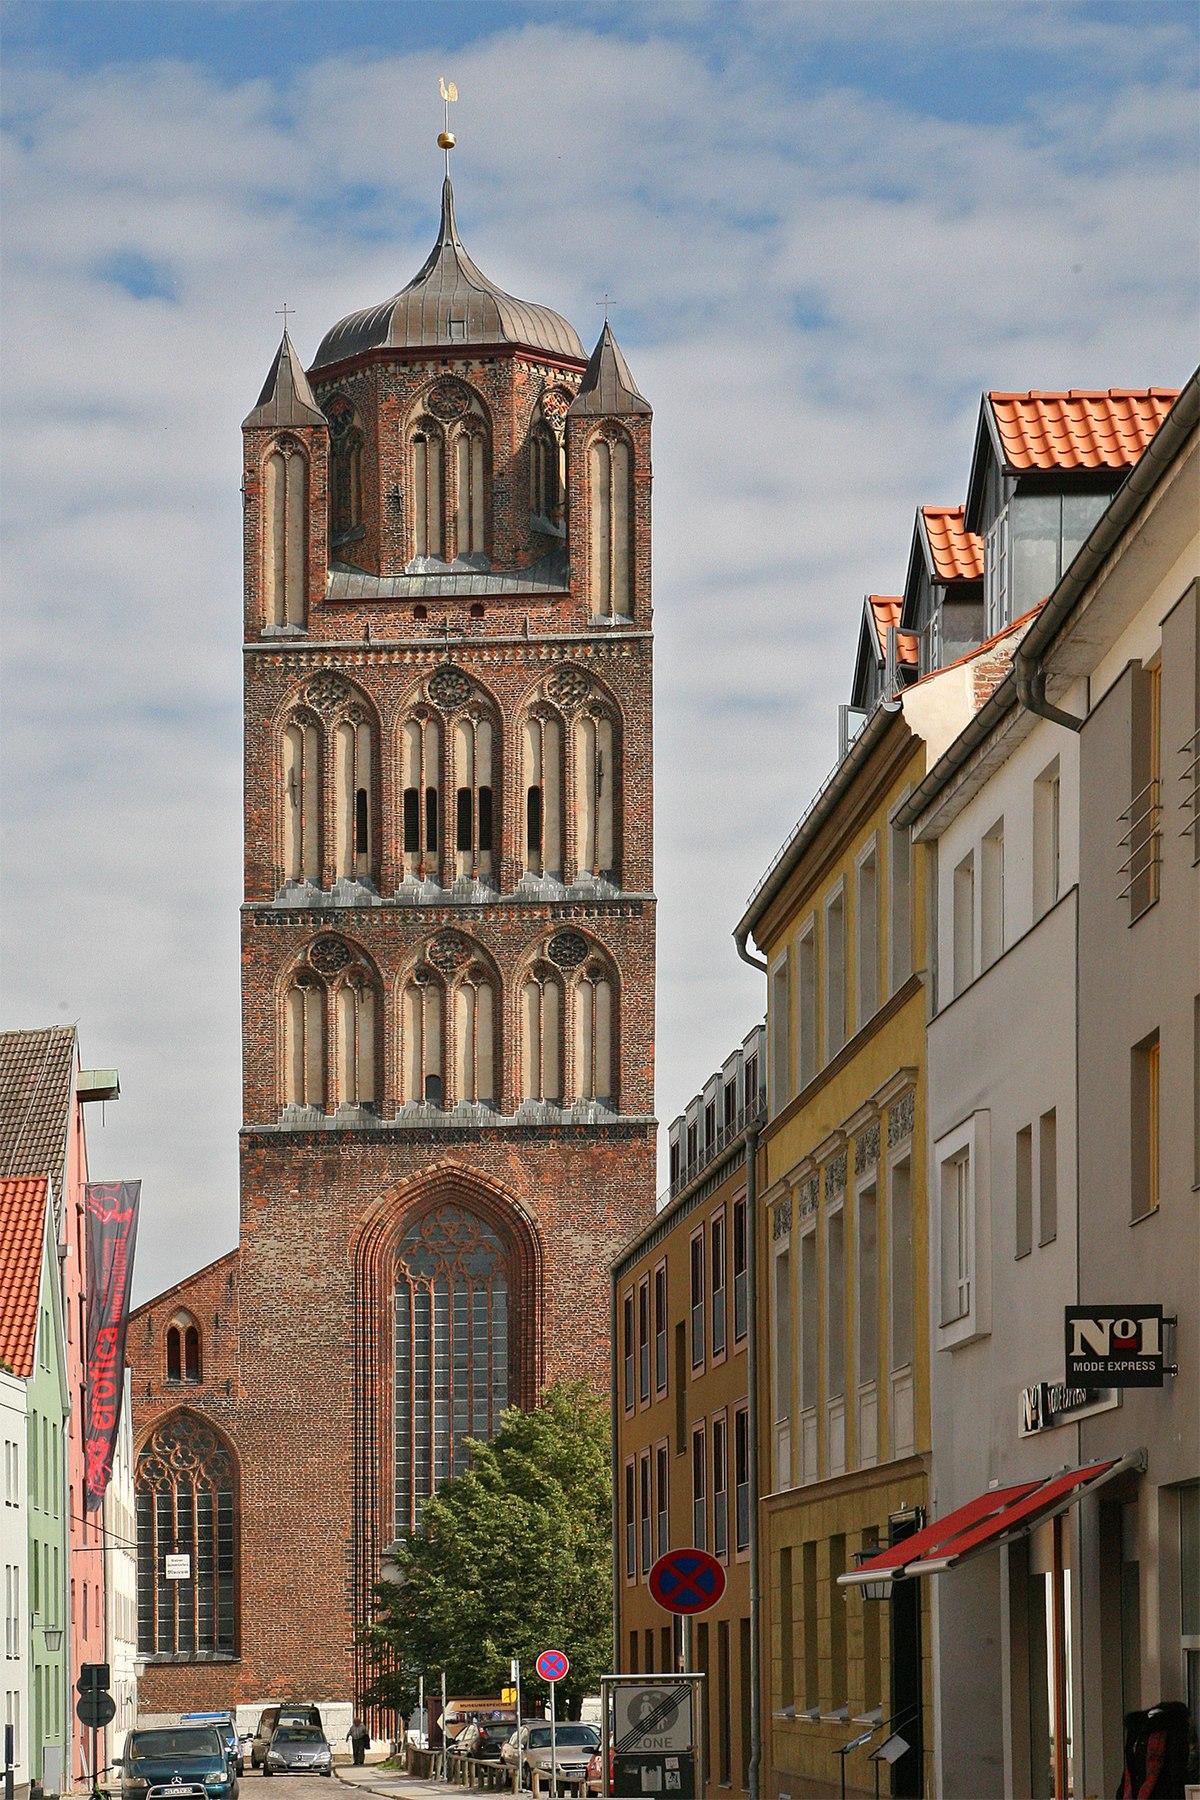 File:00 7917 Stralsund - St.-Jakobi-Kirche.jpg - Wikimedia